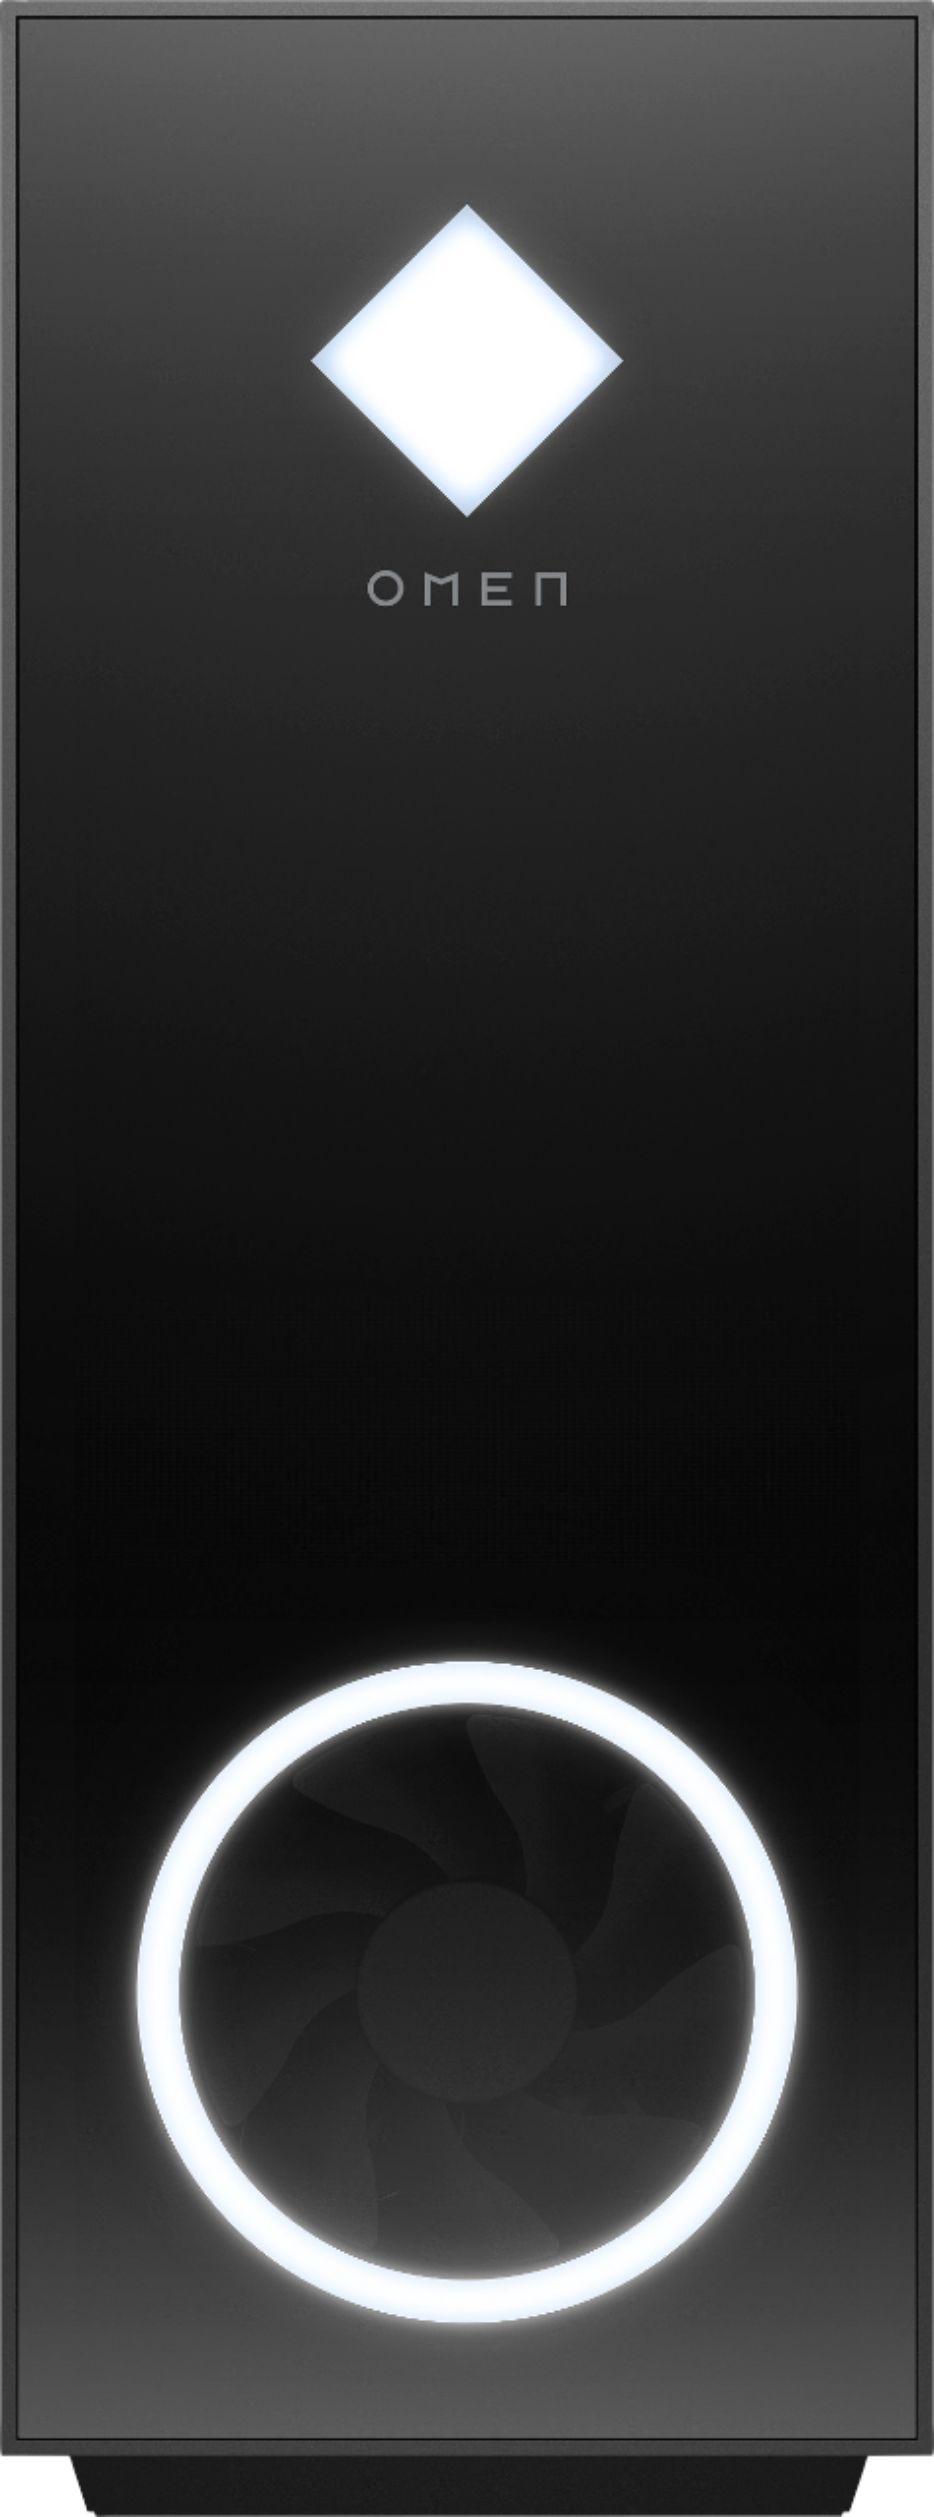 HP OMEN - Gaming Desktop - AMD Ryzen 5 5600G - 16GB Memory - NVIDIA GeForce RTX 3060 - 1TB SSD - Jet Black $1299.99